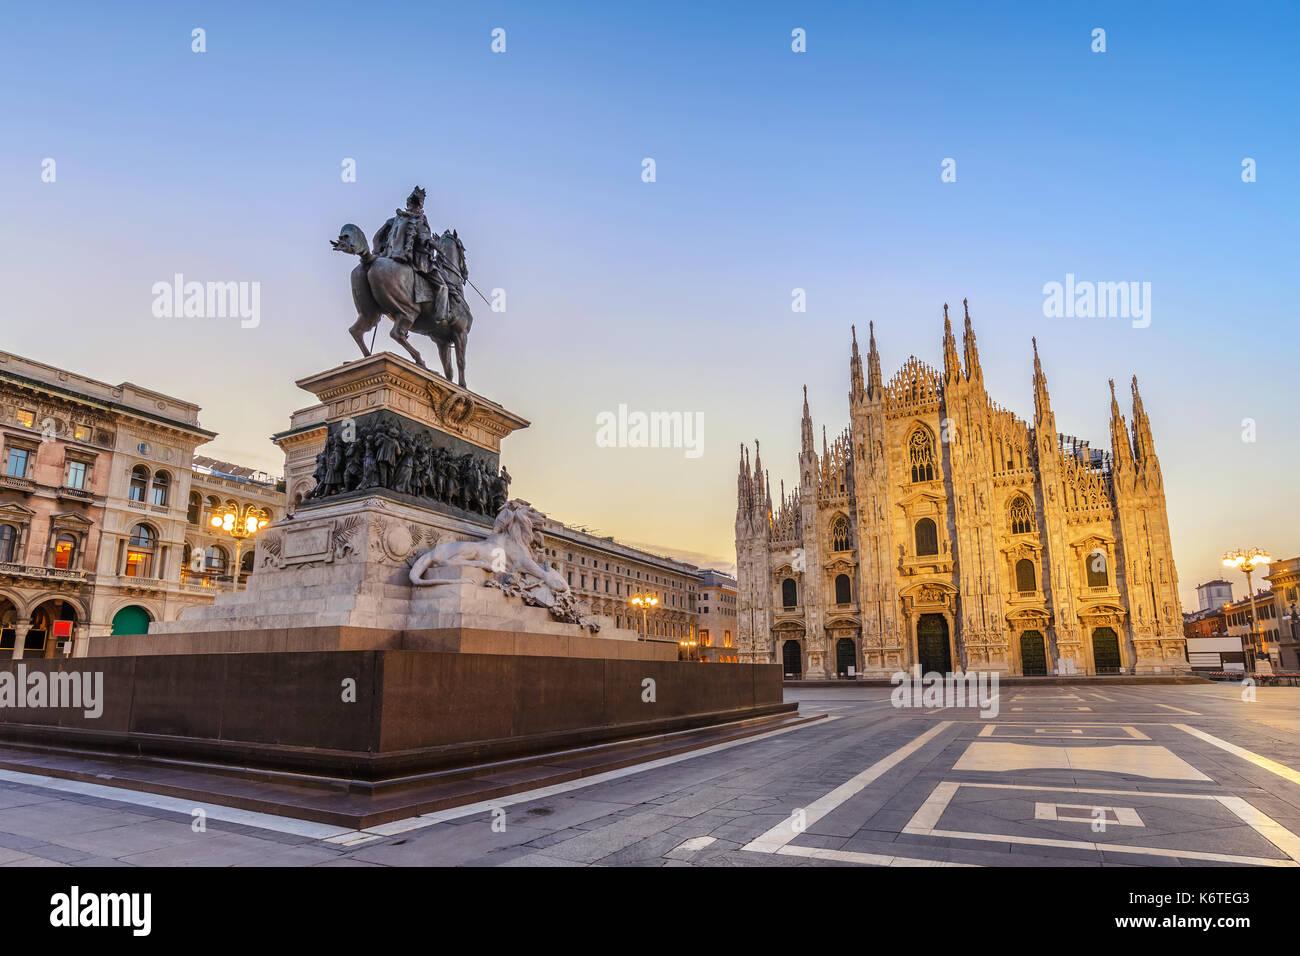 La cathédrale de Milan (Duomo de Milan) lors de l'aube, Milan (Milan), Italie Photo Stock